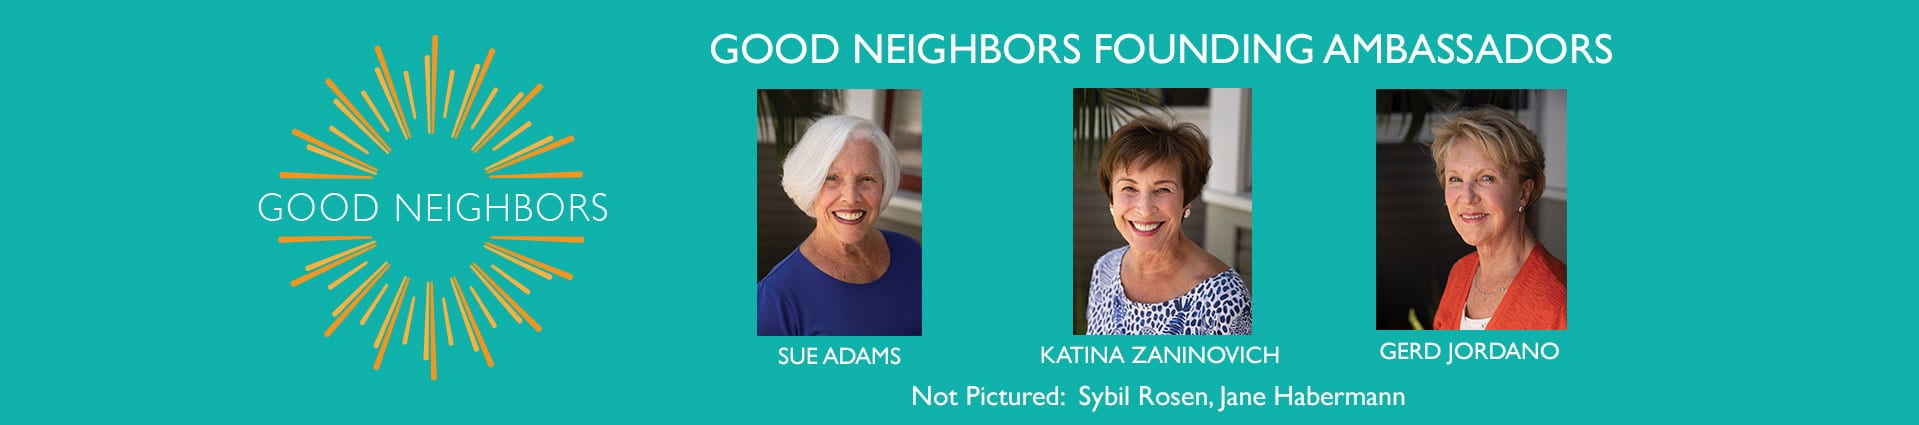 good-neighbors-2